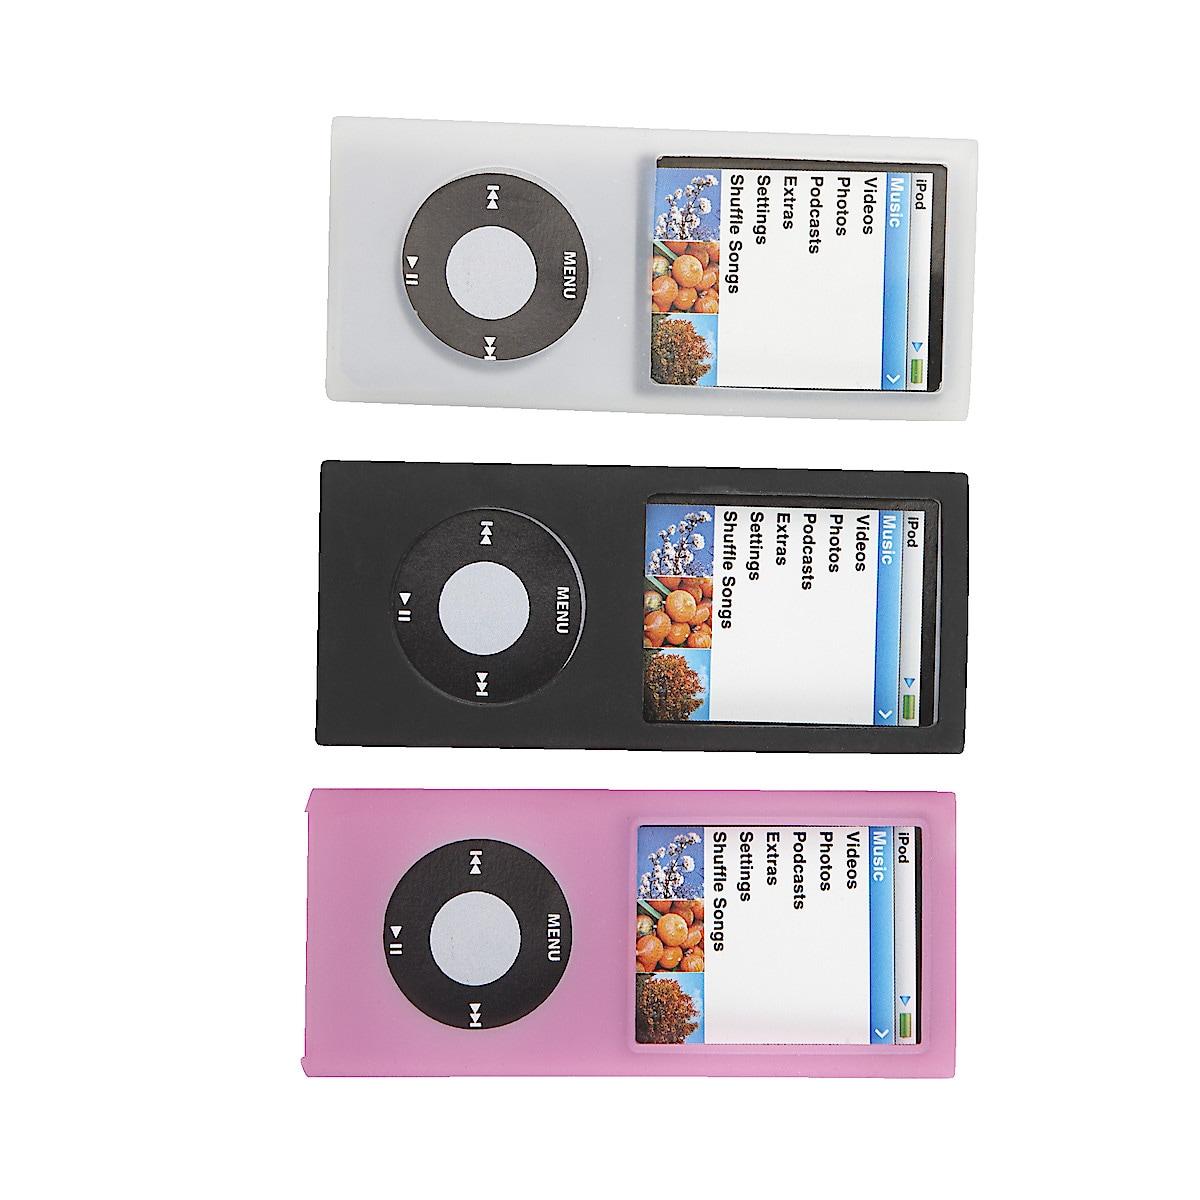 Silikonikotelo iPod nano generation 4:lle